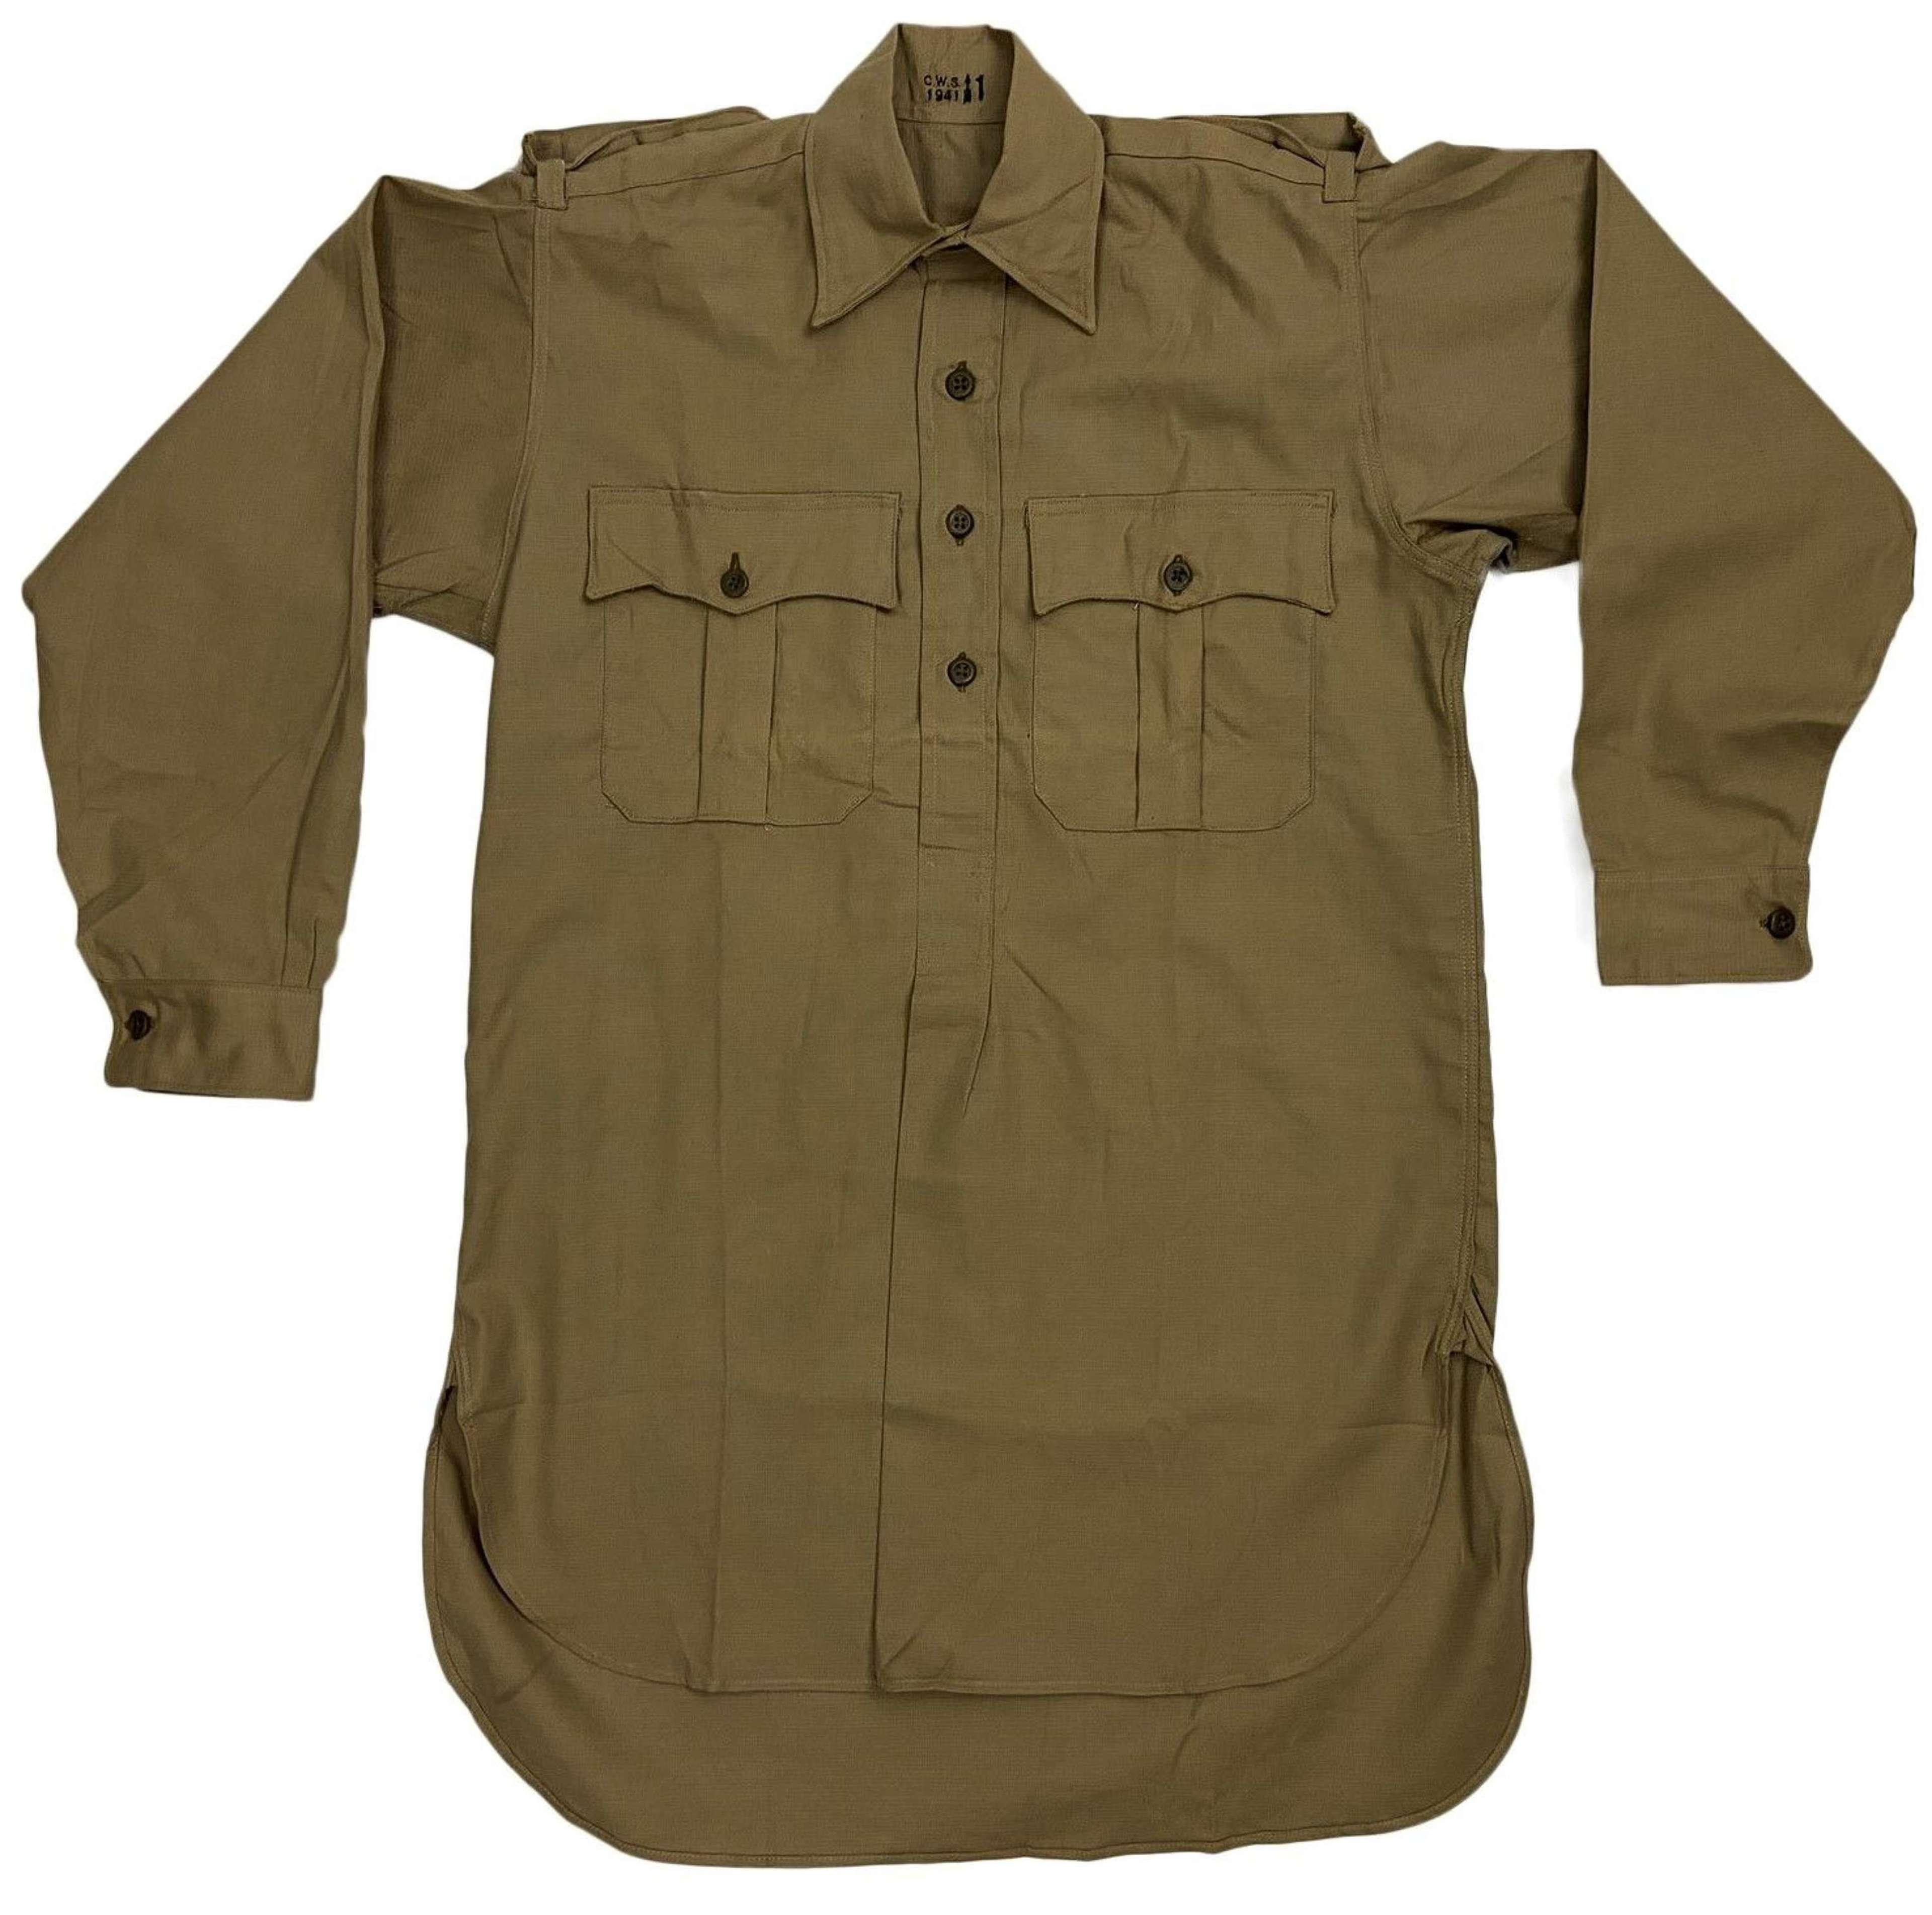 Rare original 1941 Dated British Army Khaki Drill Shirt by 'C.W.S'